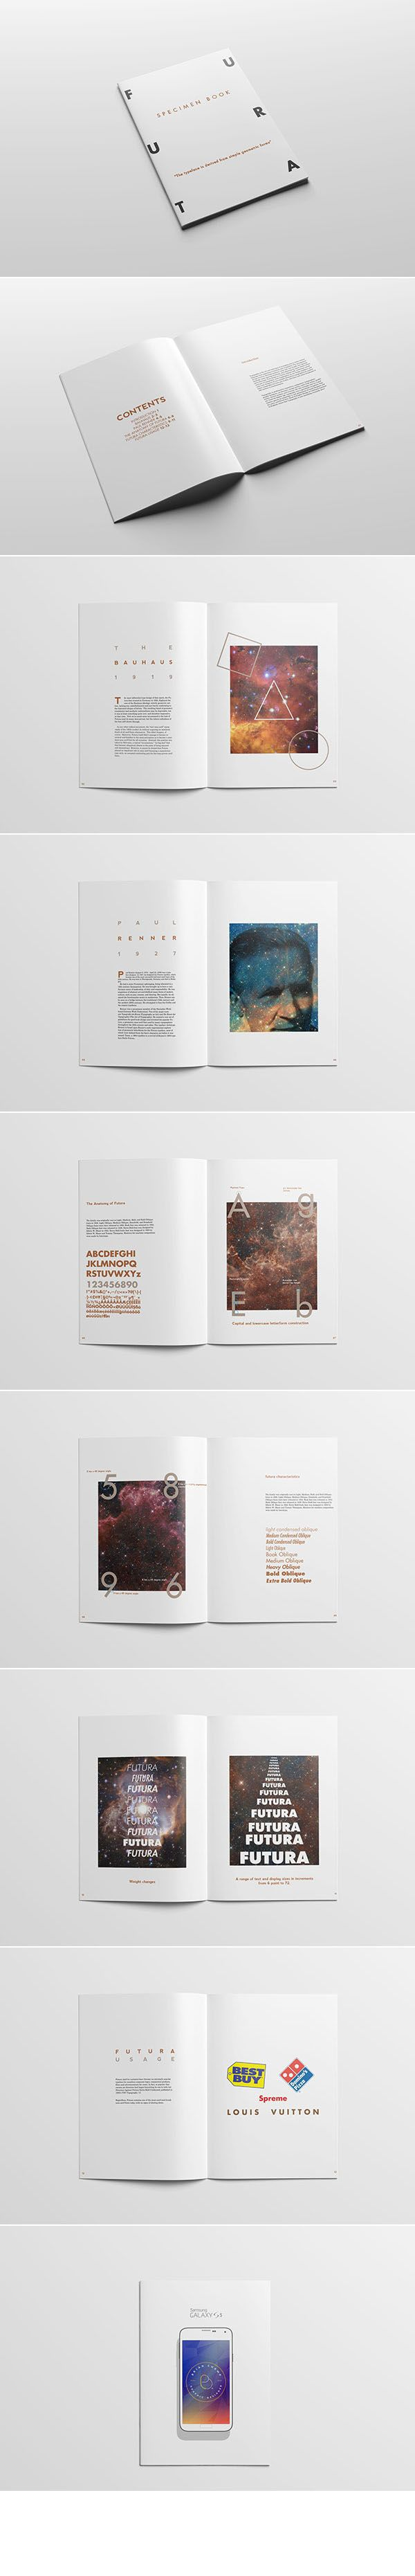 A Type Specimen Magazine showcasing Futura geometric Sans Serif typeface. #brianchamp